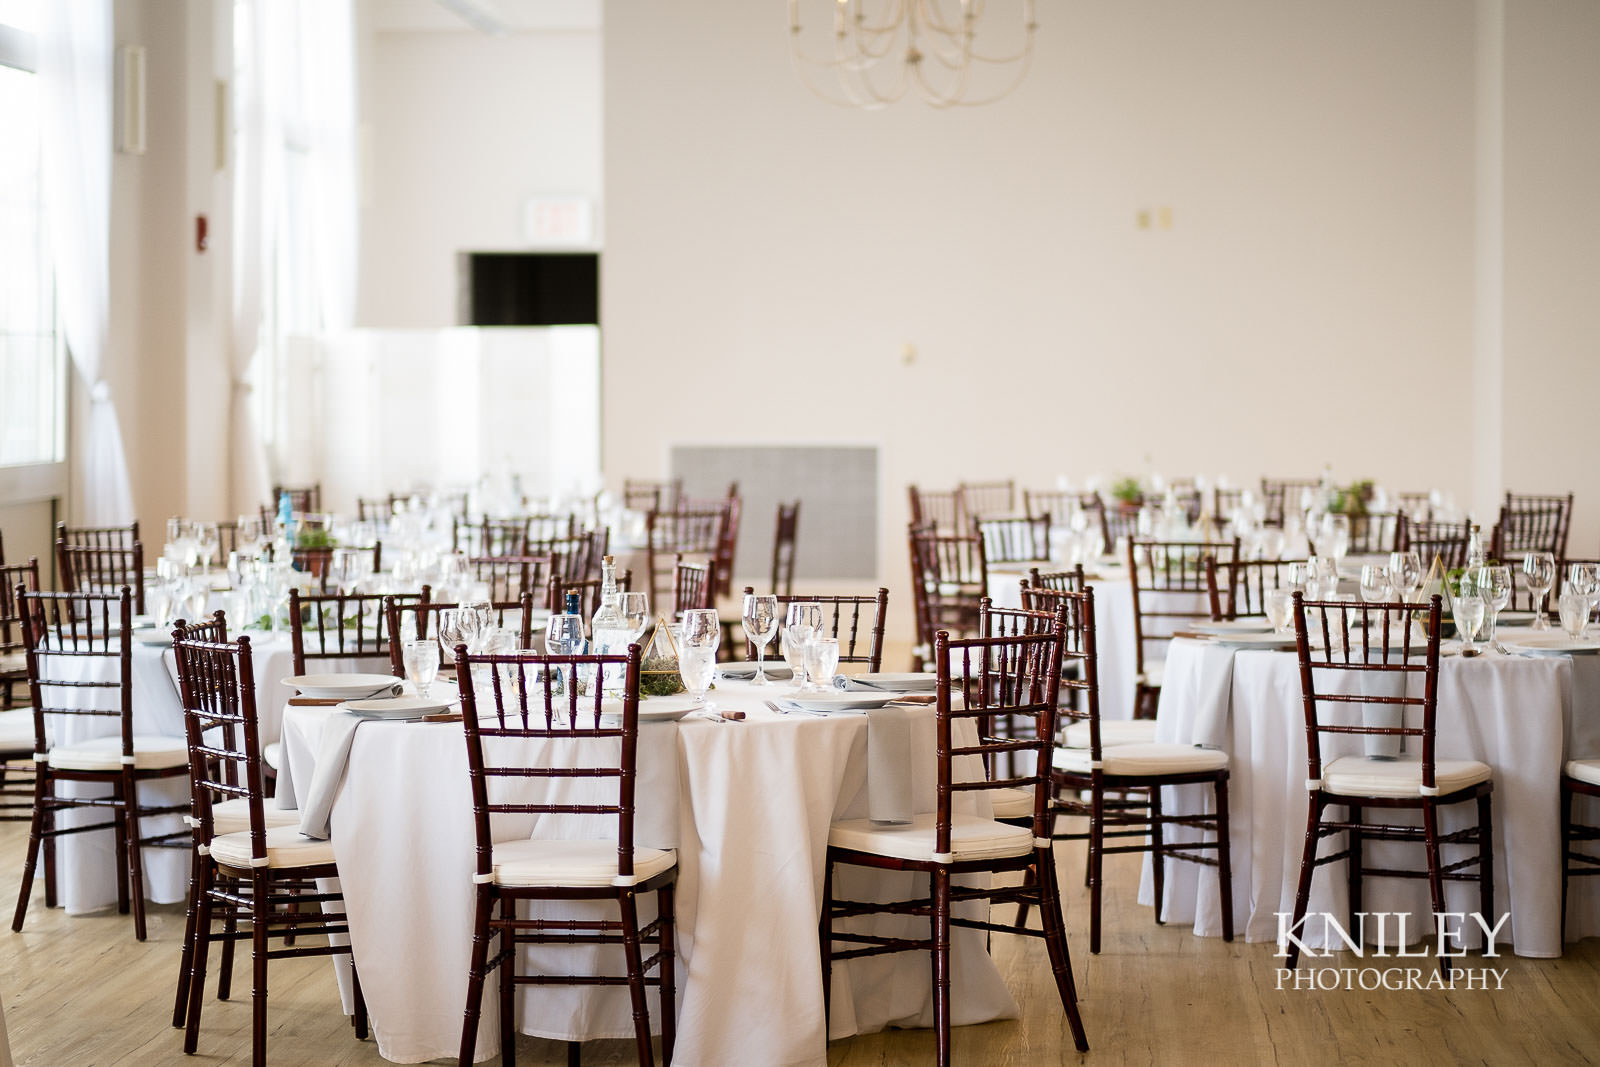 52-Arbor-at-the-Port-Rochester-NY-Wedding-Photography.jpg